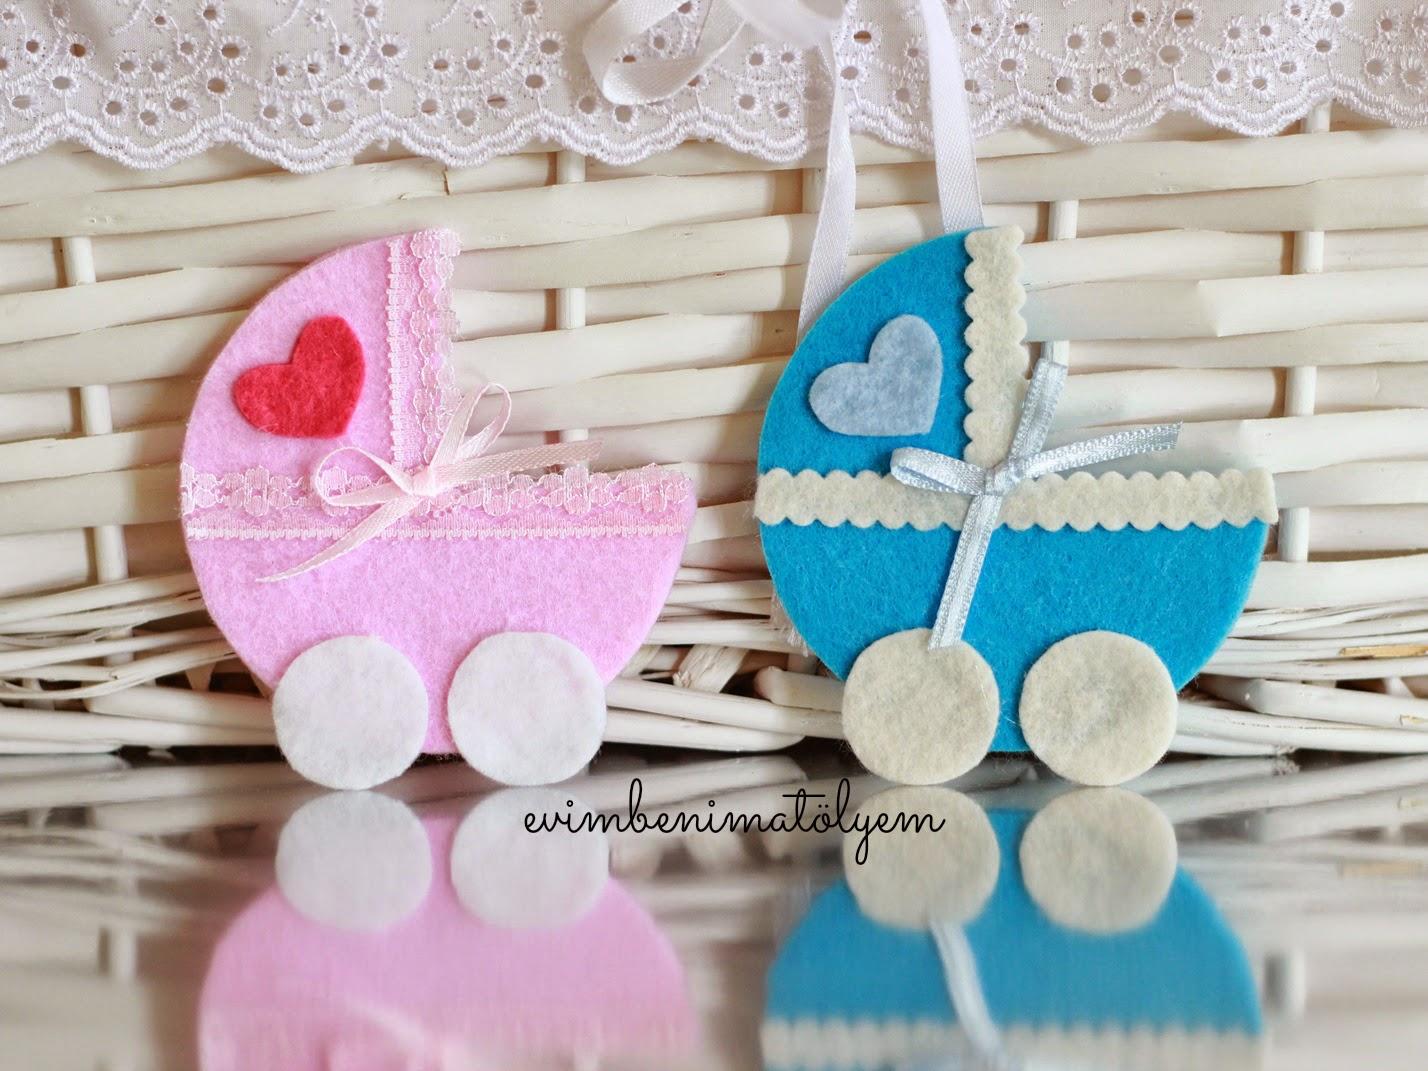 keçe bebek arabası, keçe magnet, keçe bebek şekeri